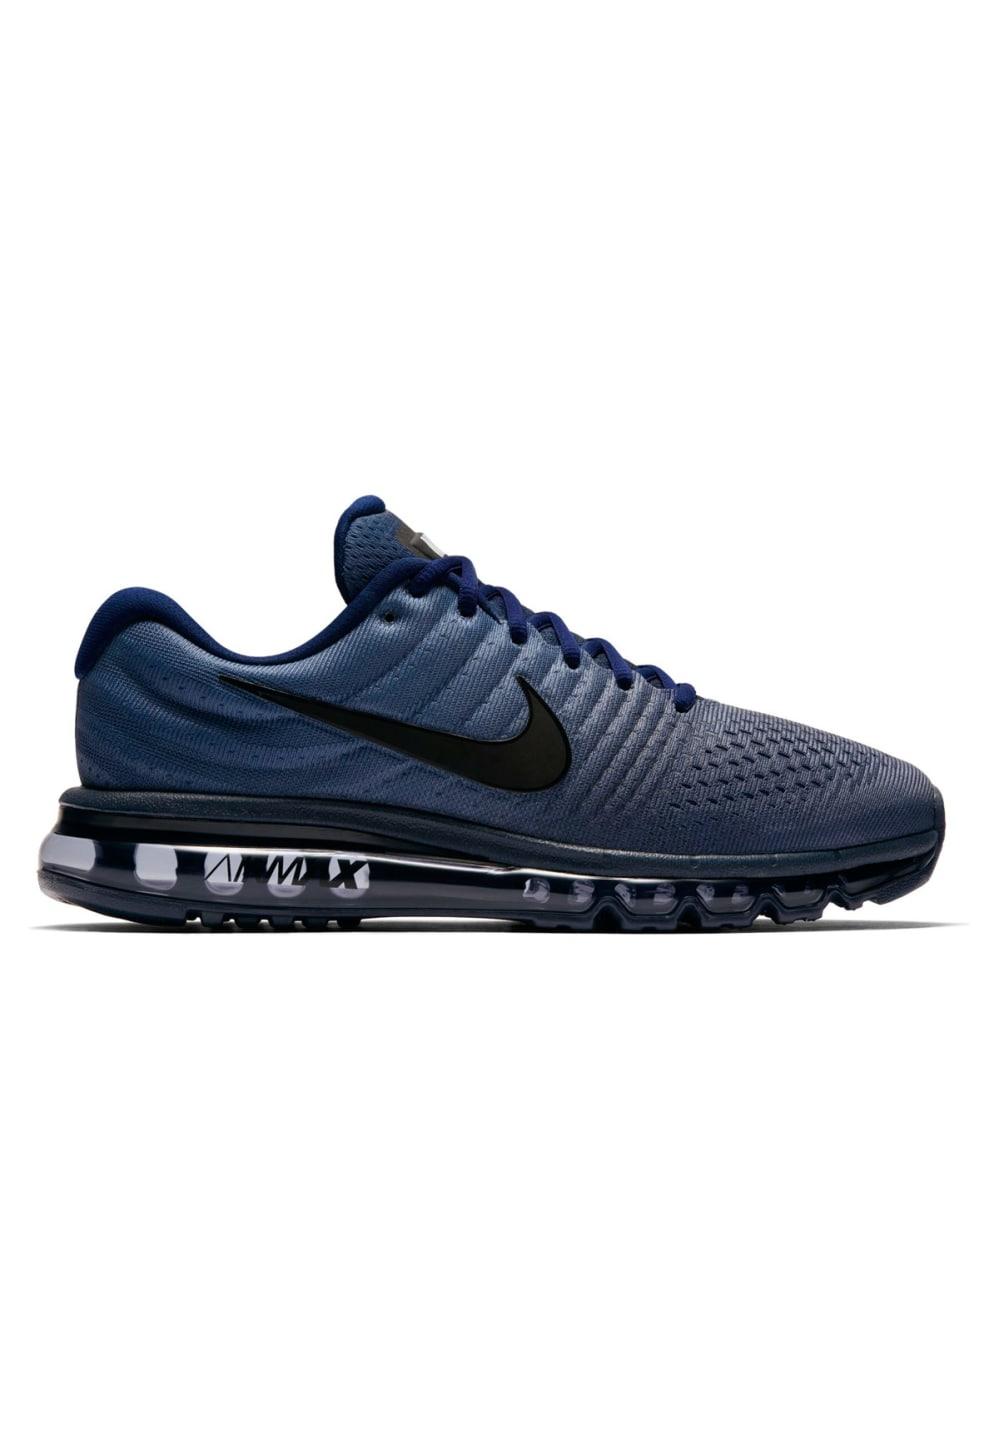 Air Running 2017 Bleu Chaussures Max Nike Homme Pour rdxCBeo